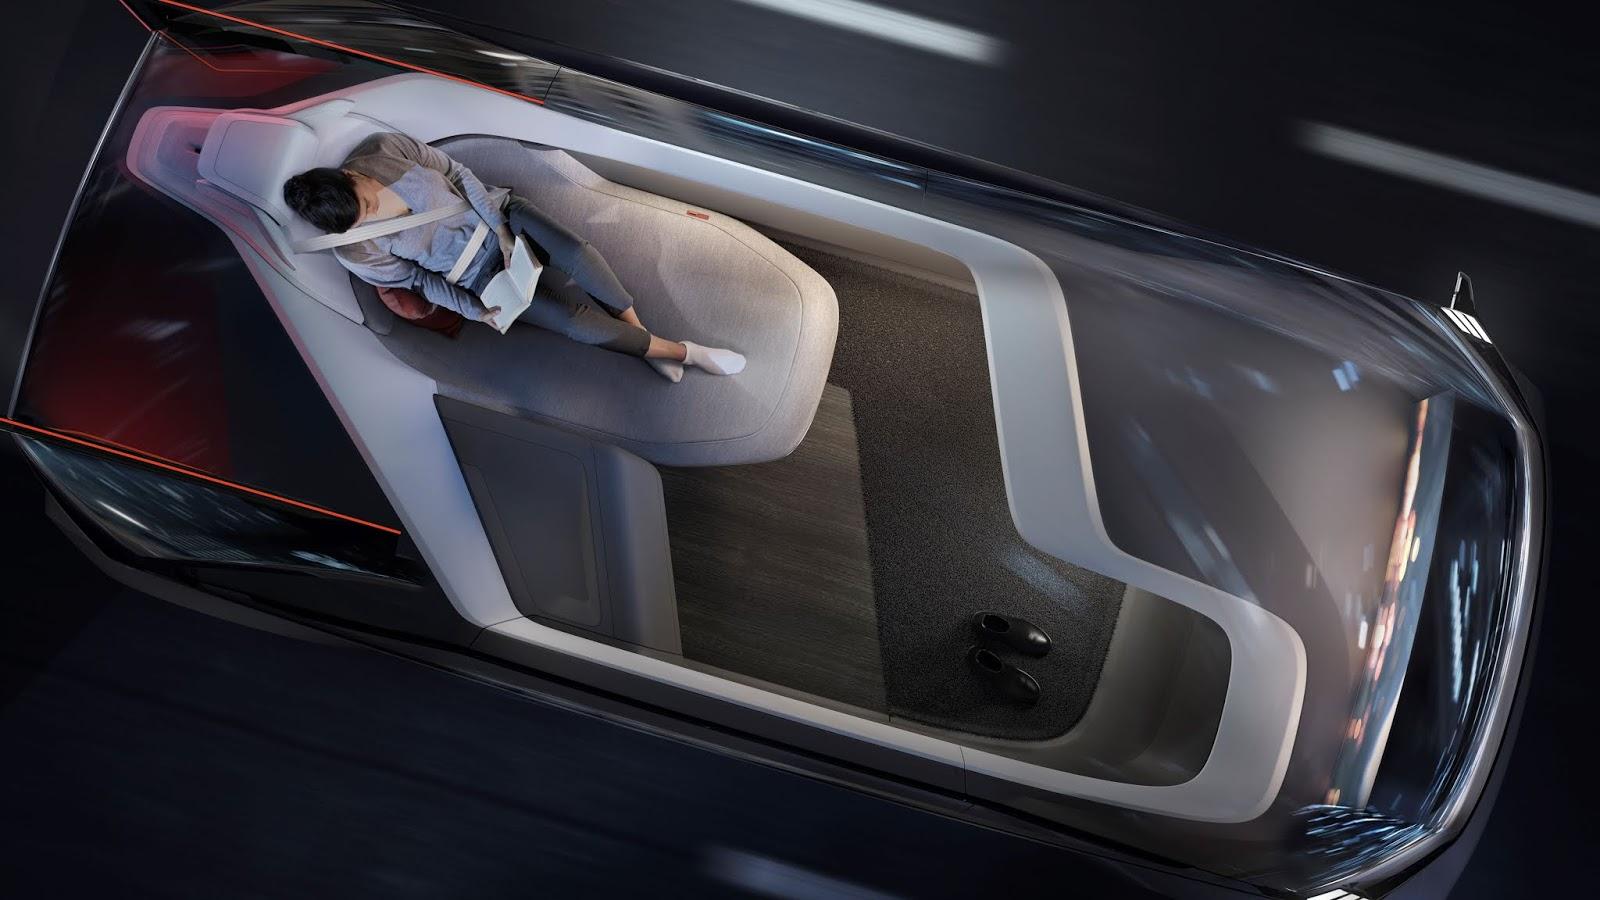 237046 Volvo 360c Interior Sleeping Το όραμα της Volvo χωρίς... τιμόνι Electric cars, Volvo, αυτόνομα, Αυτόνομη οδήγηση, Τεχνολογία